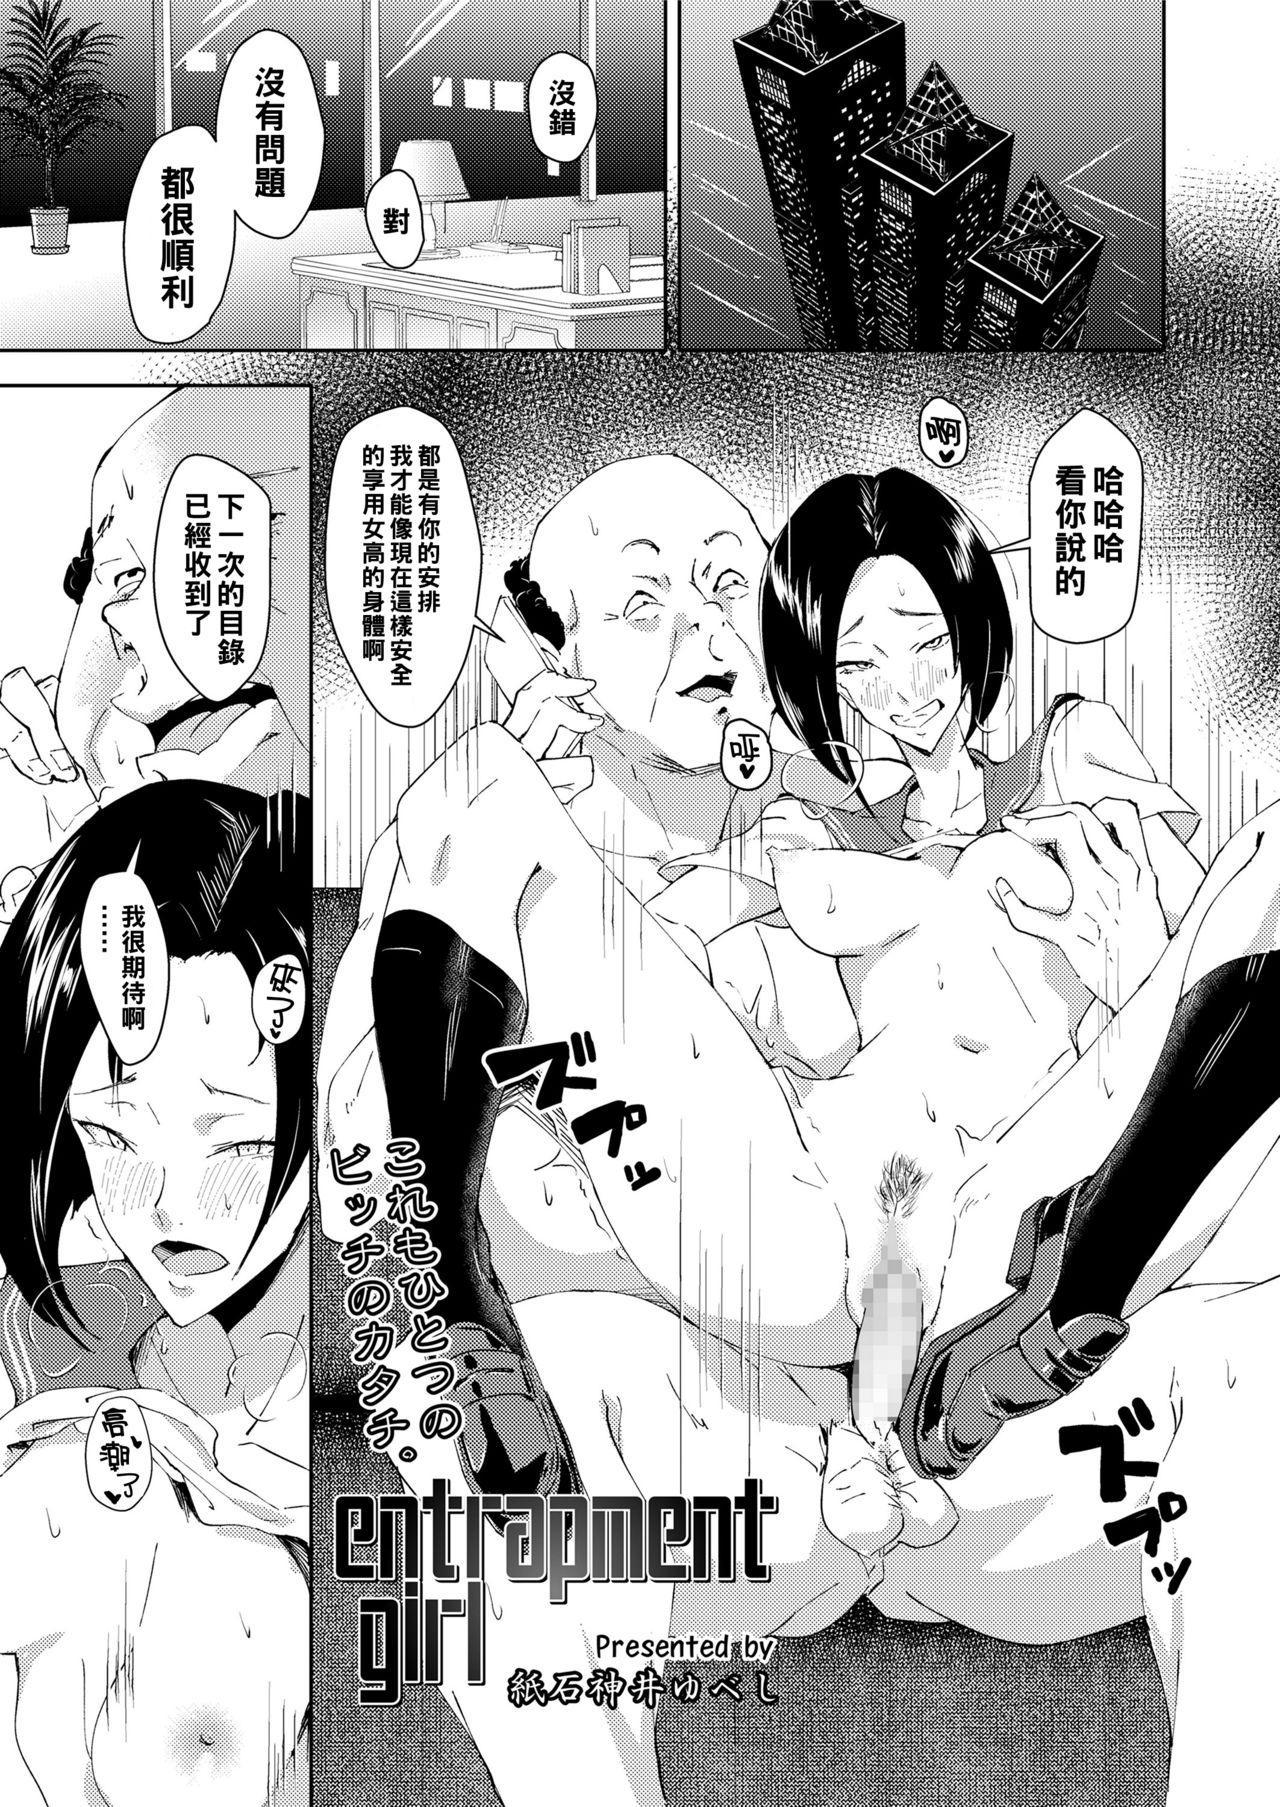 entrapment girl [紙石神井ゆべし] (COMIC saseco Vol.2) [中国翻訳] [DL版] 0